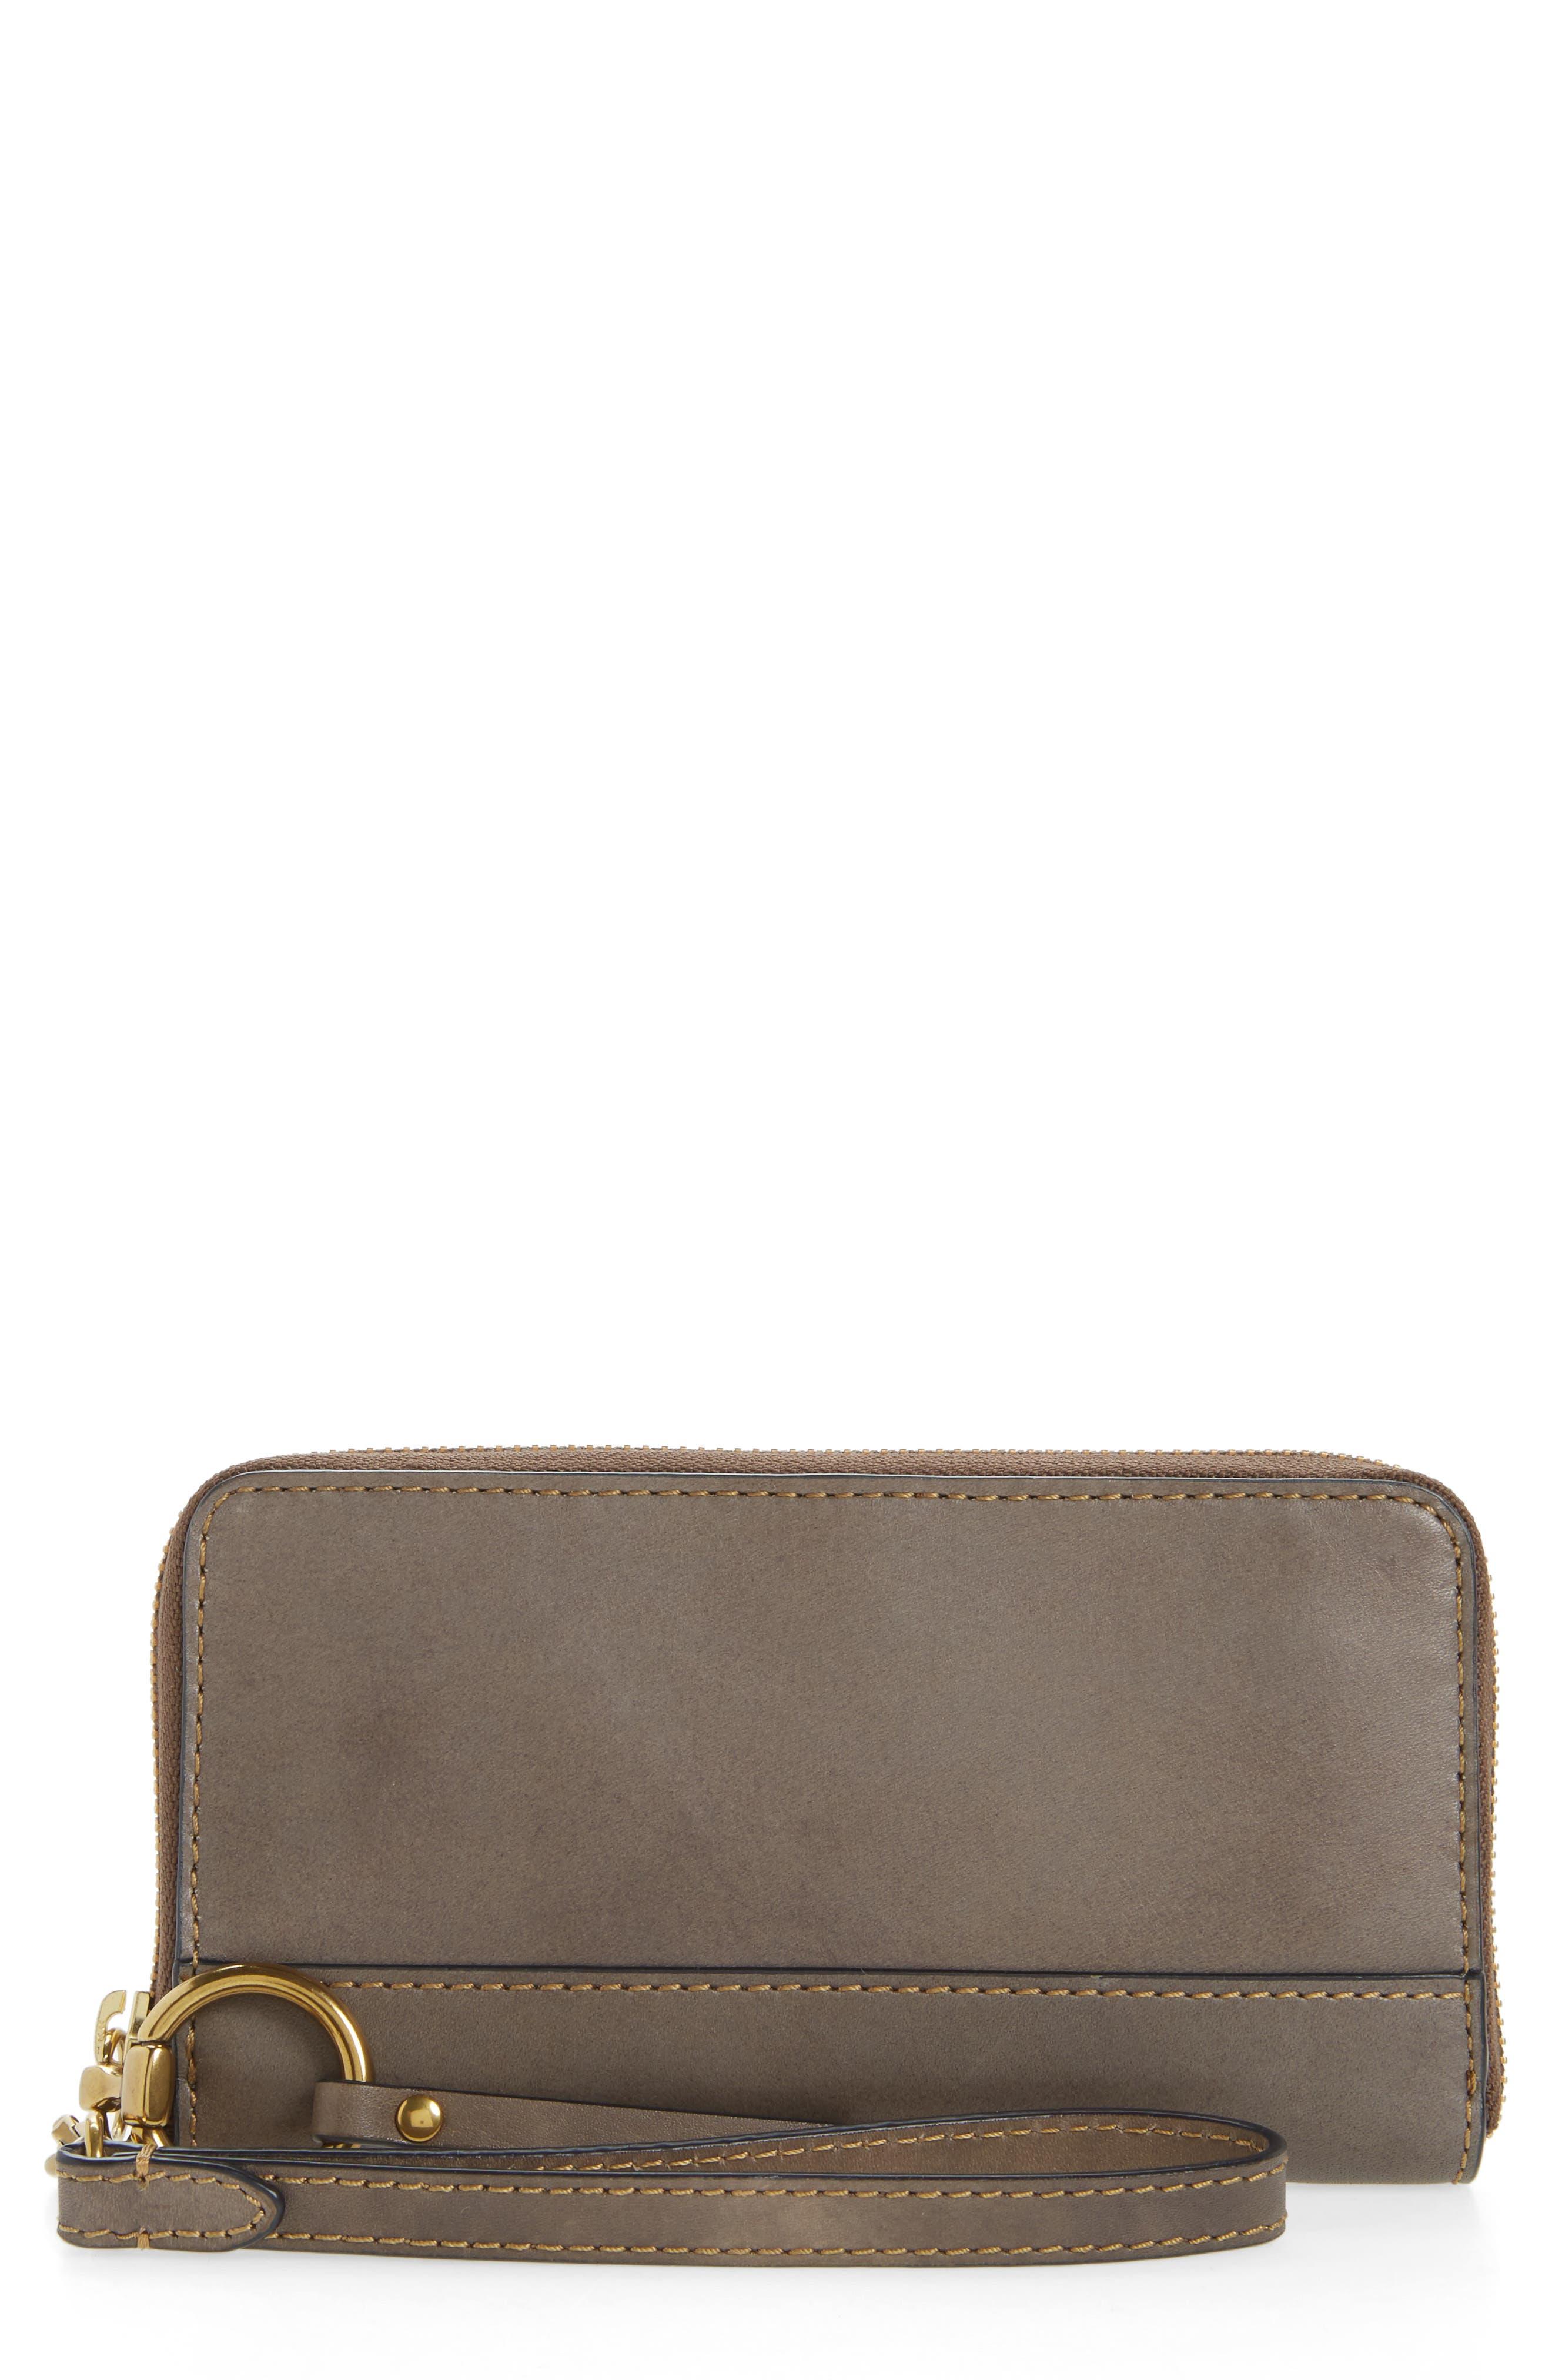 Ilana Harness Phone Leather Zip Wallet,                             Main thumbnail 1, color,                             Grey